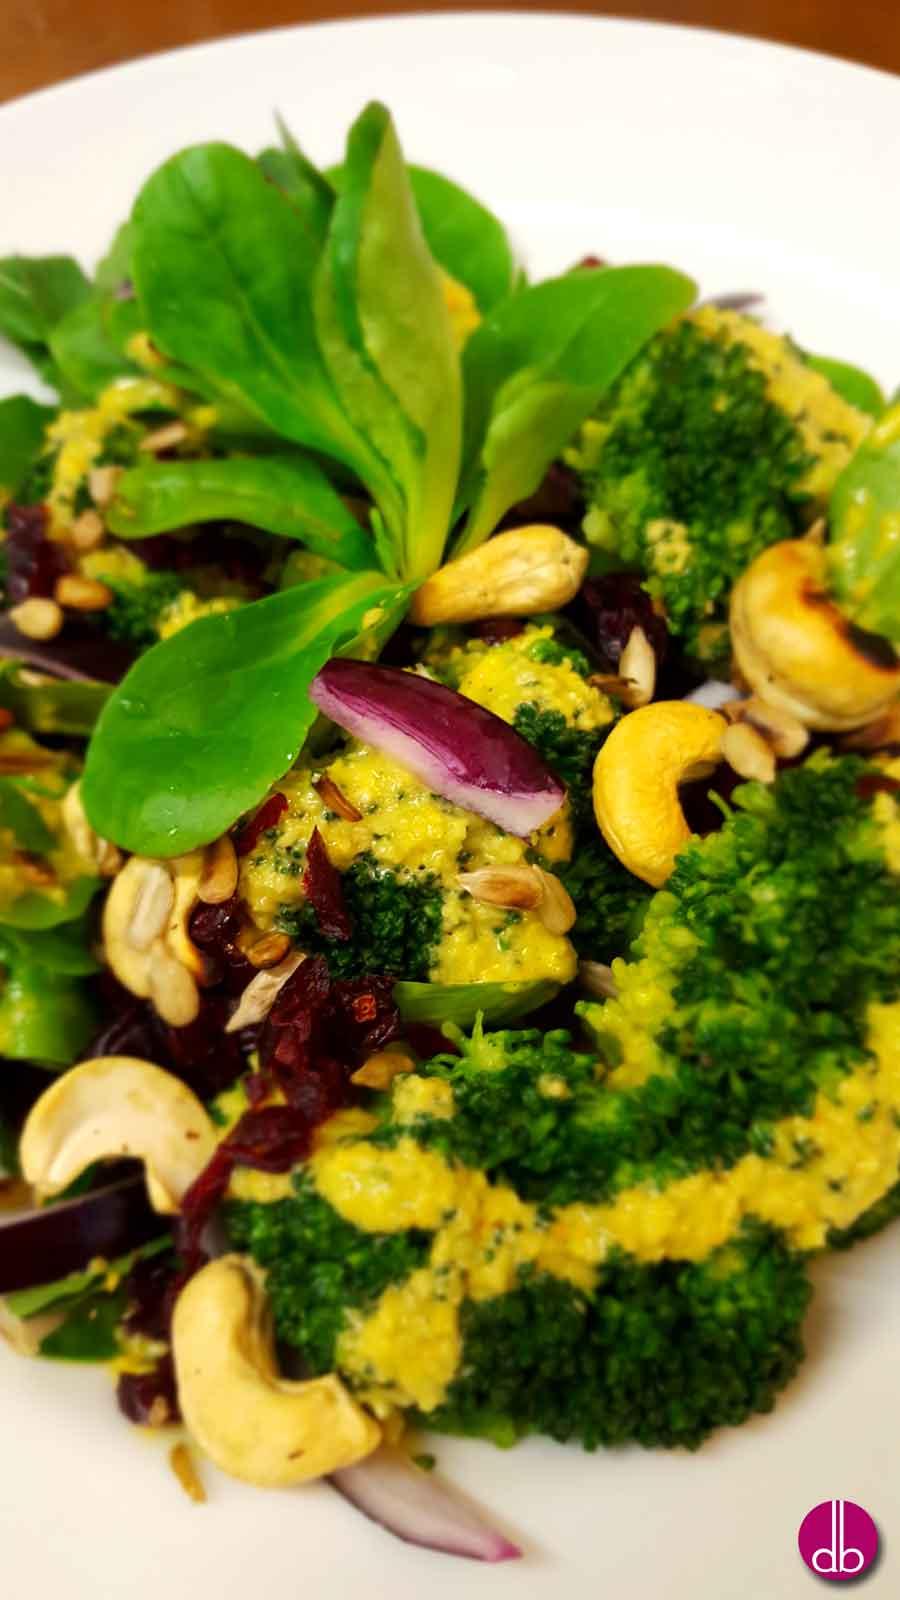 Rezept: veganer Brokkoli-Salat mit Cranberry und Curry-Nuss-Dressing